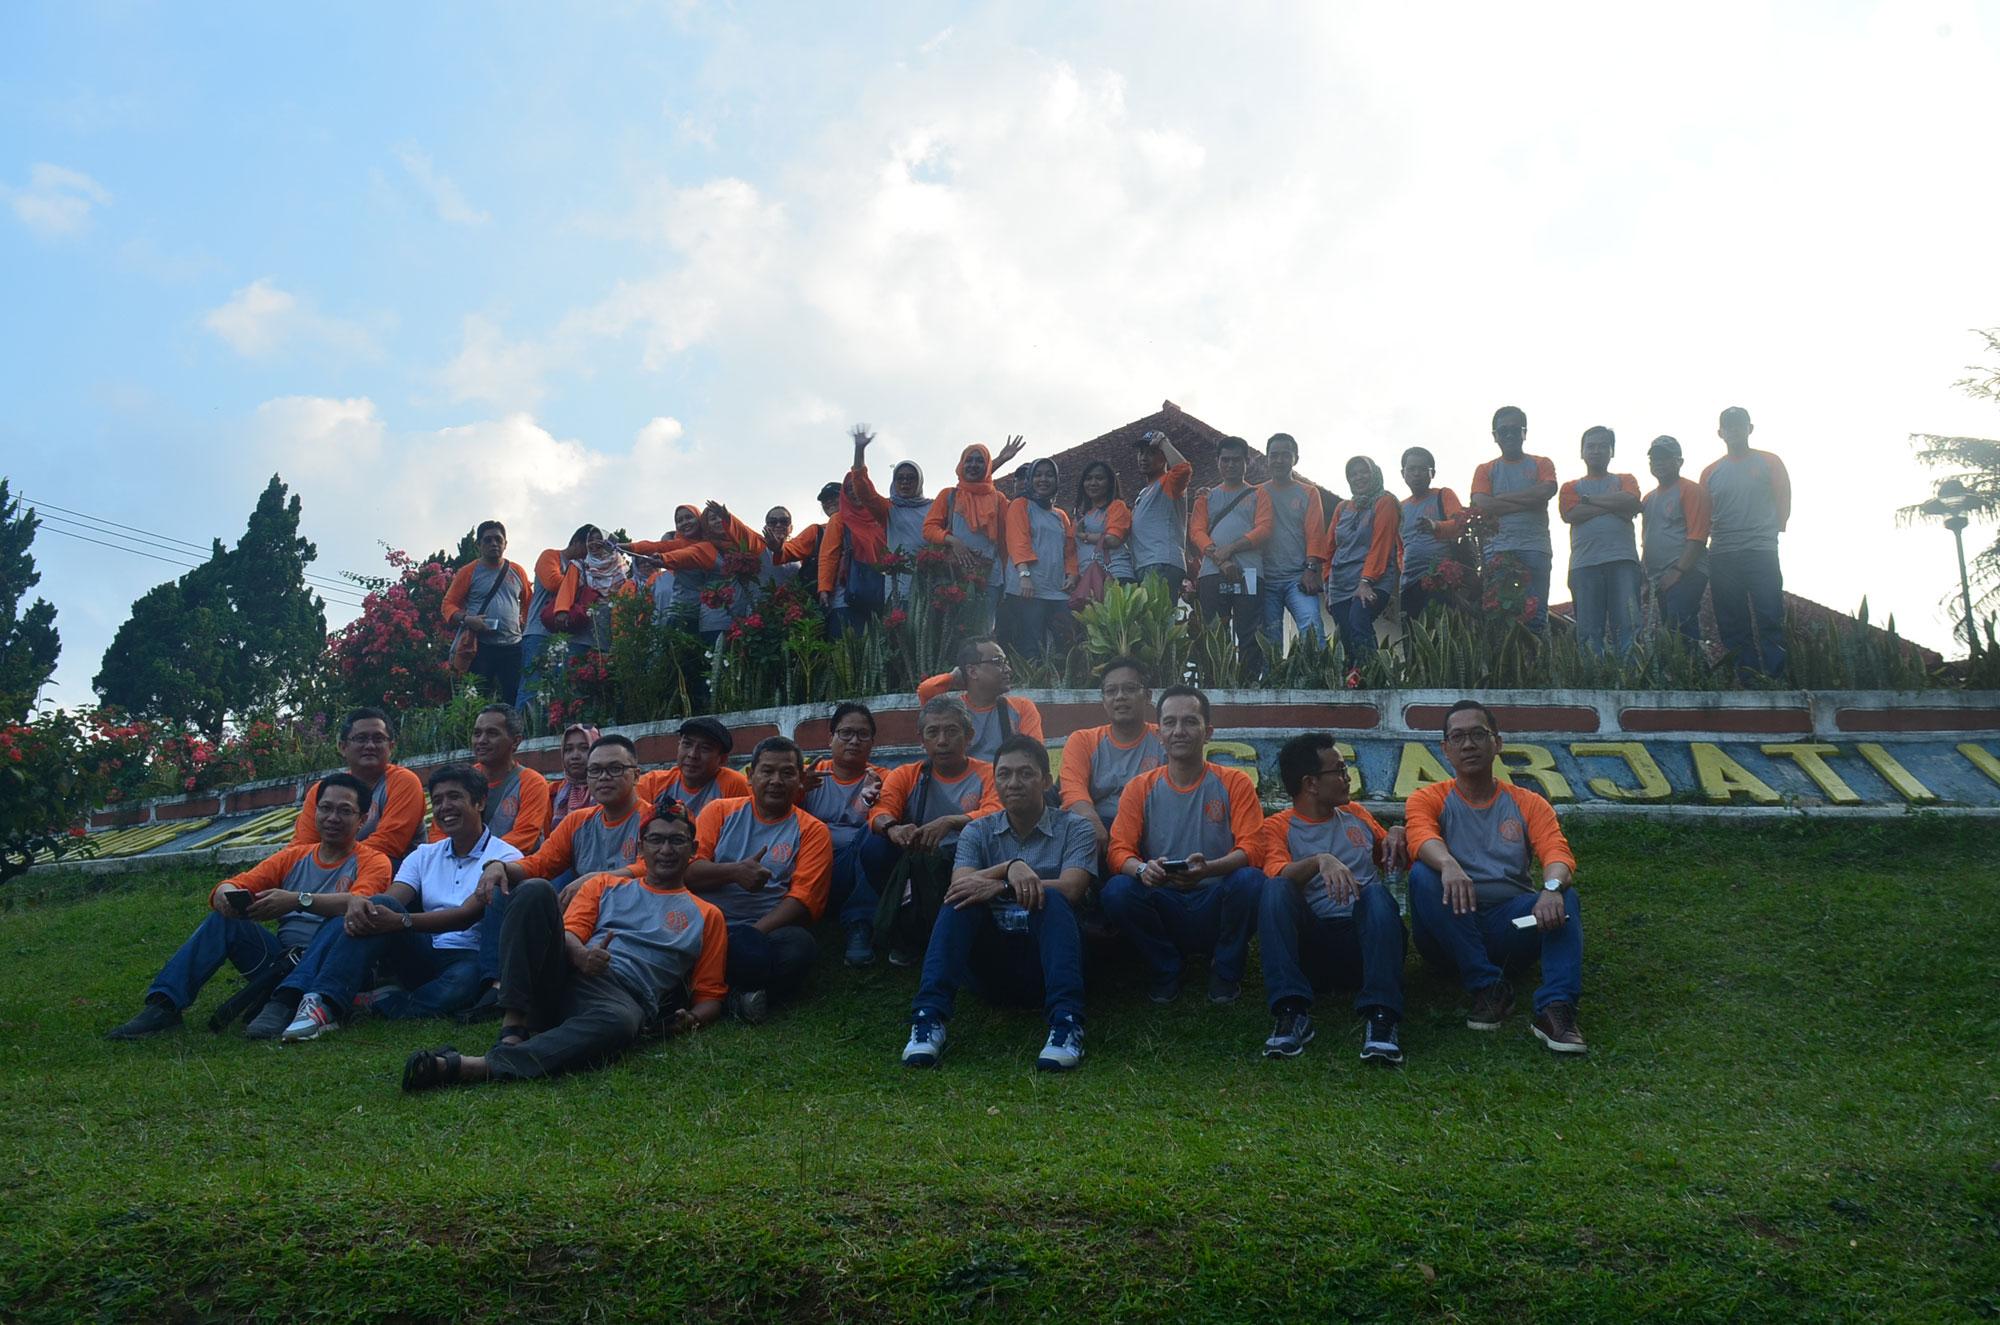 Rekomendasi 5 Tempat Bagus di Cirebon